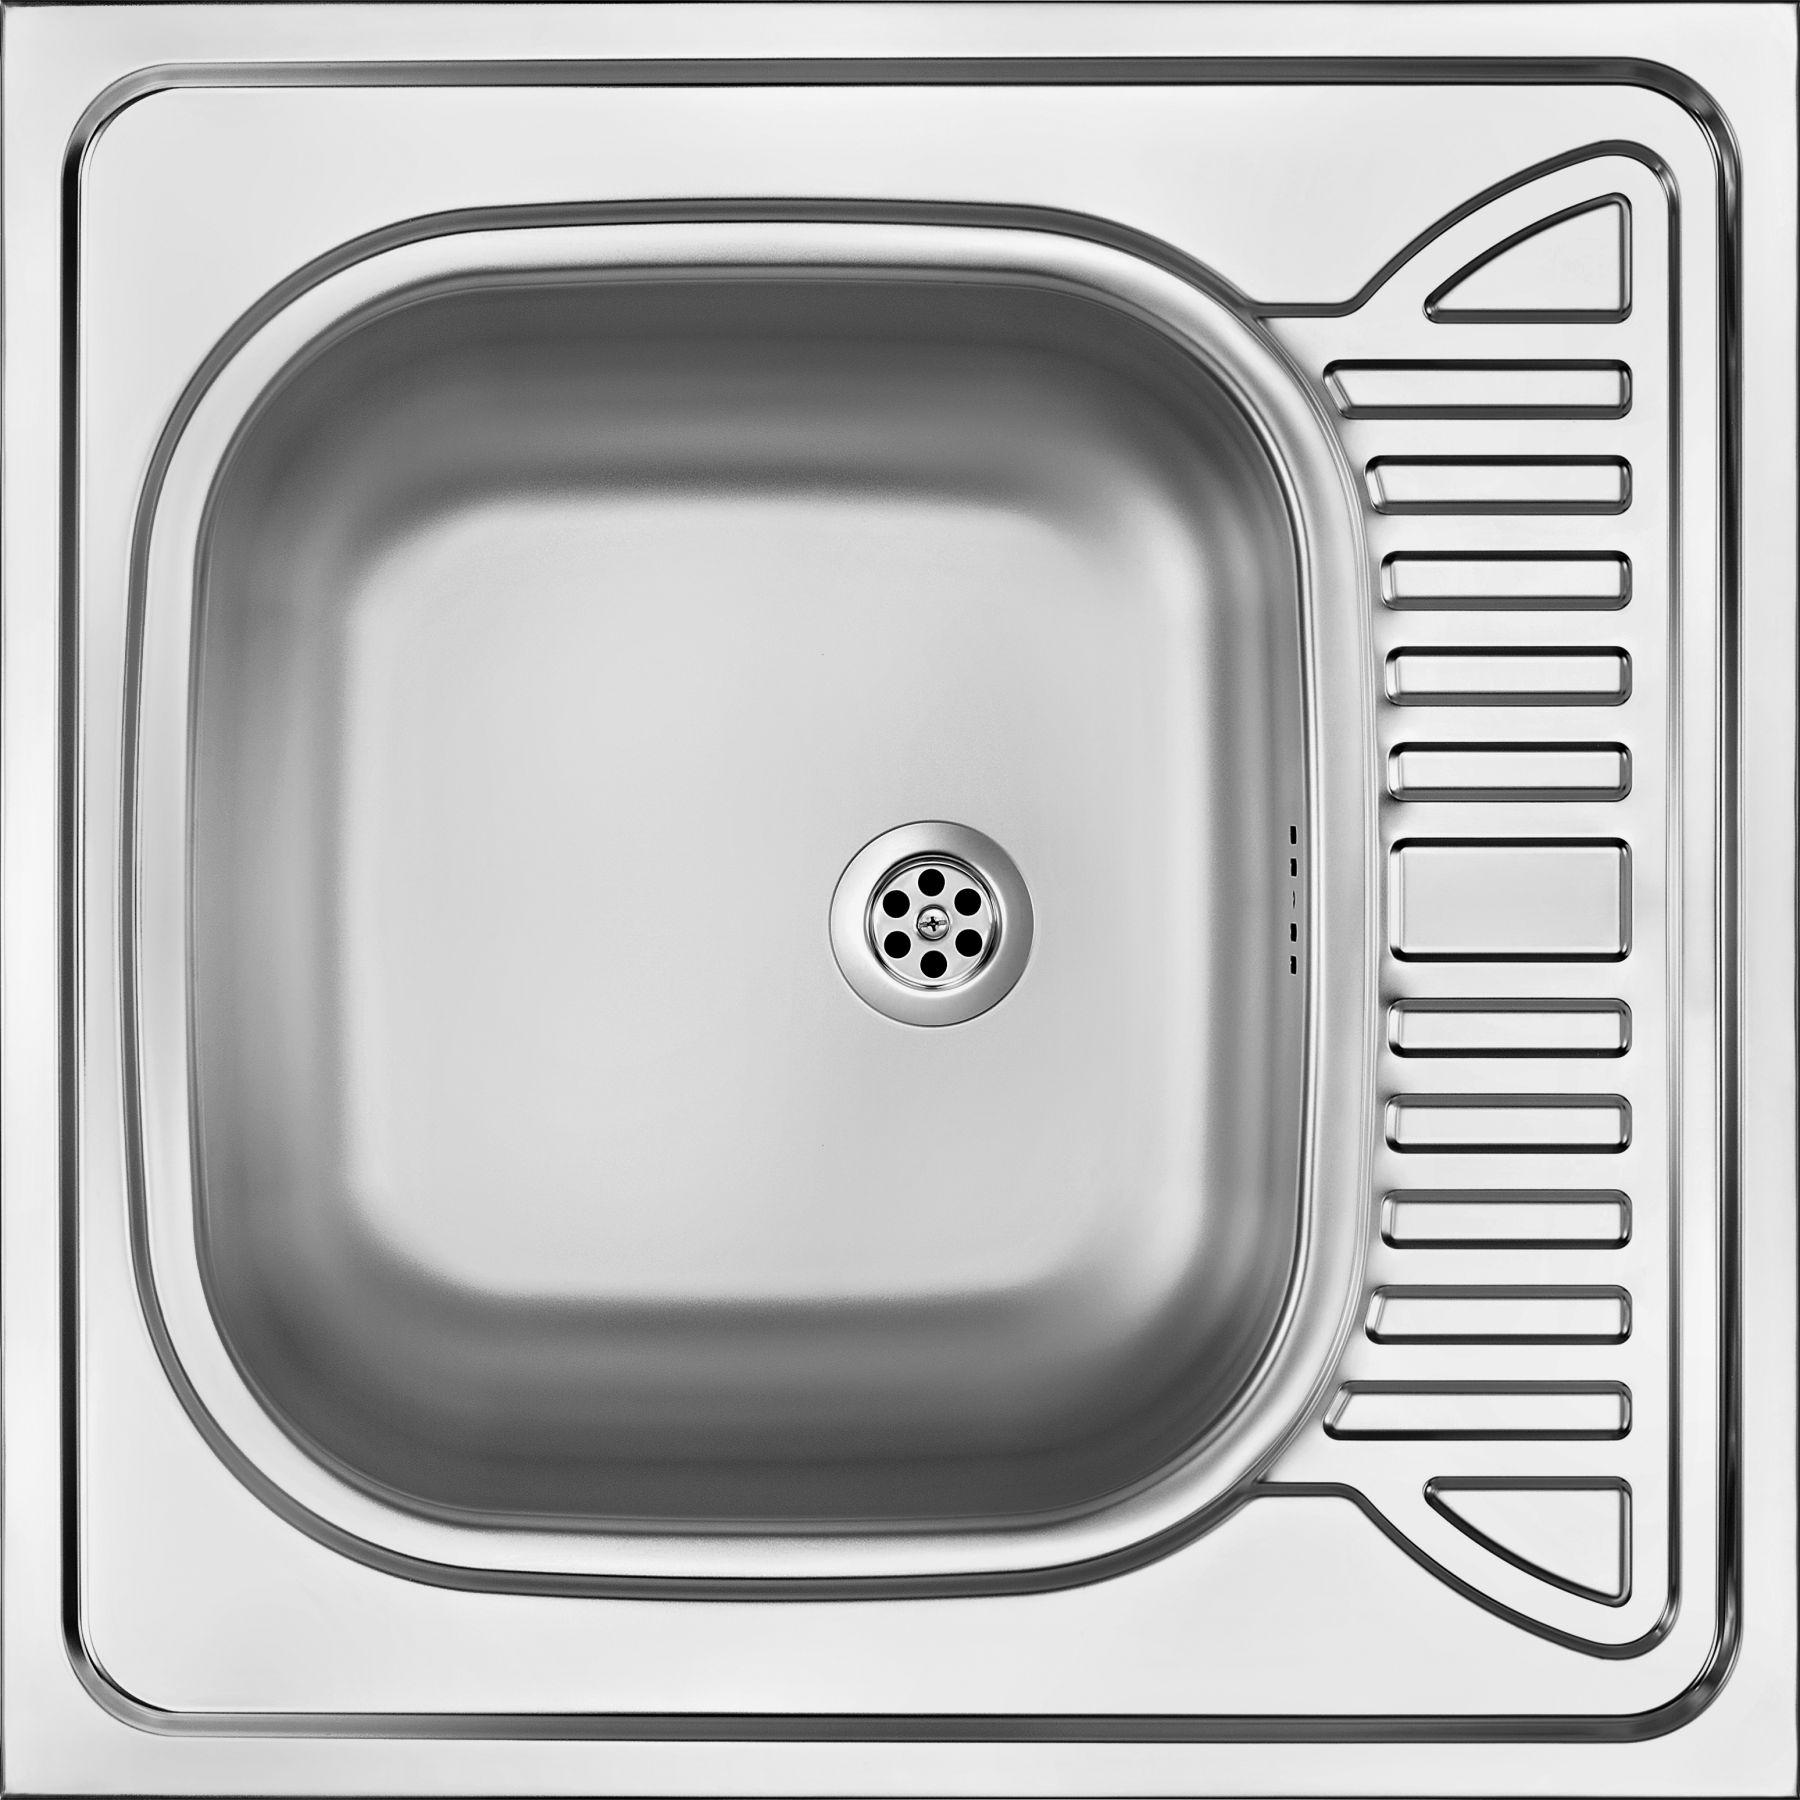 Edelstahlspüle 60x60 cm 1-Becken - Reversibel